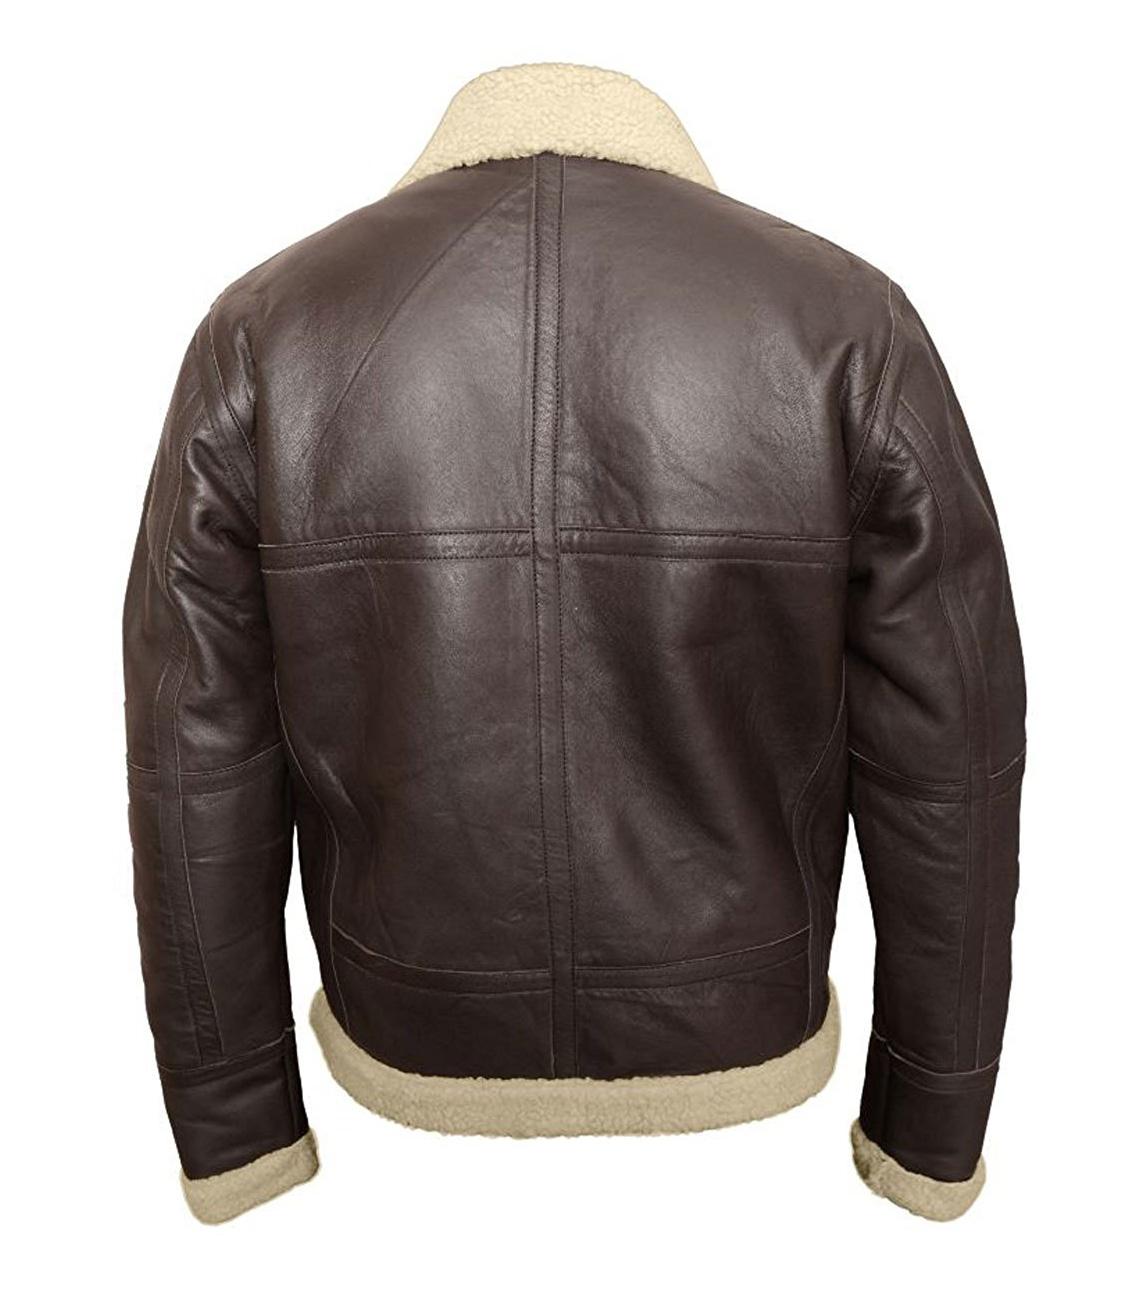 b3-bomber-jacket-f